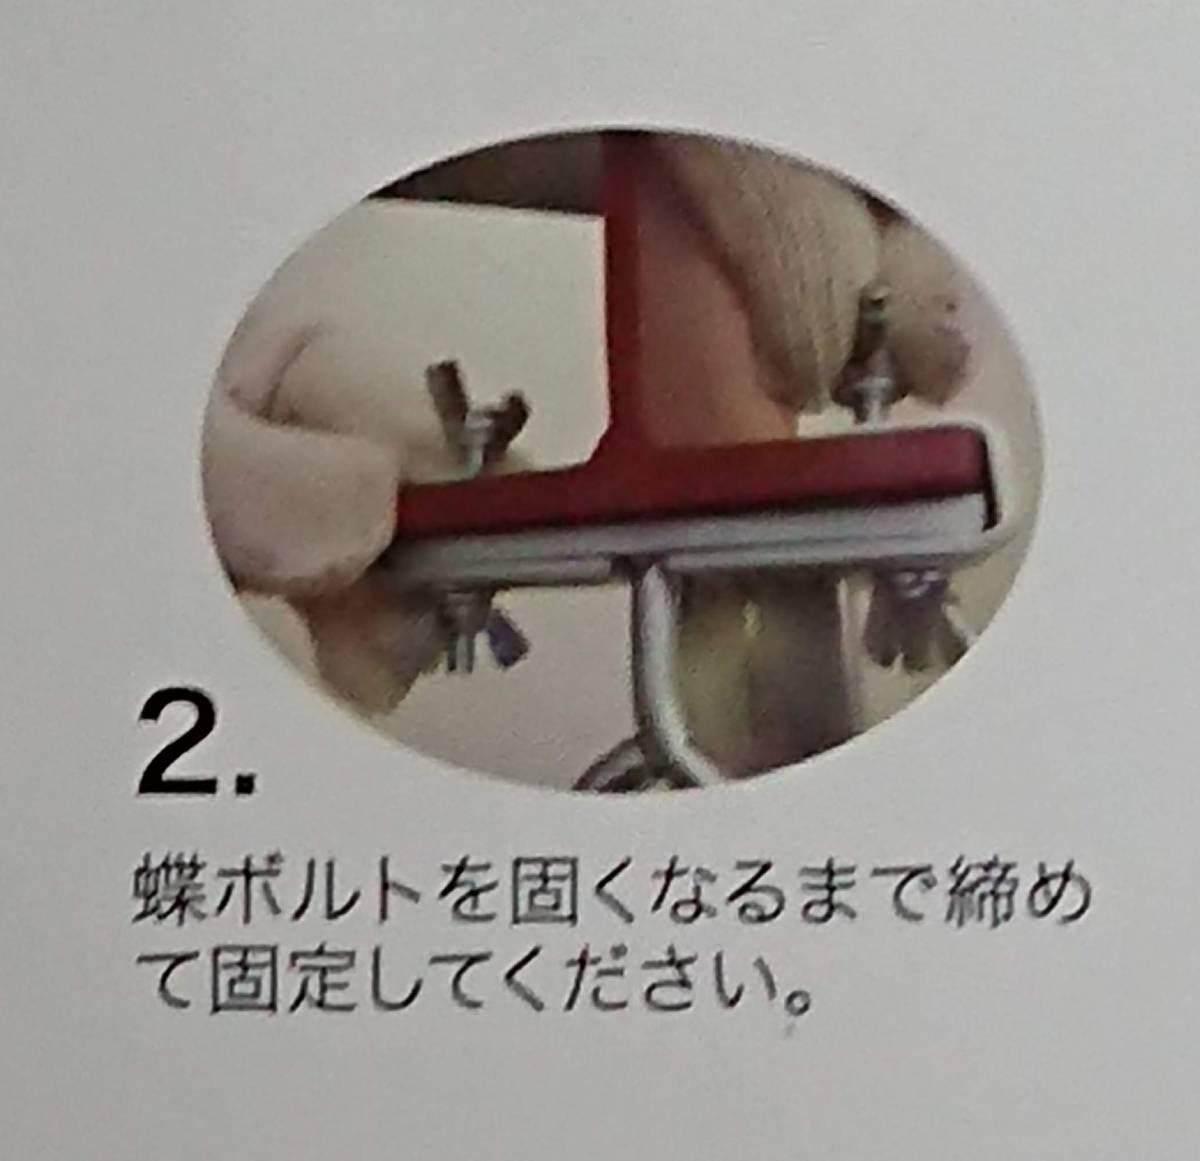 H鋼吊る~す(小) H鋼吊り金具 H鋼吊るす ヒートン_画像3